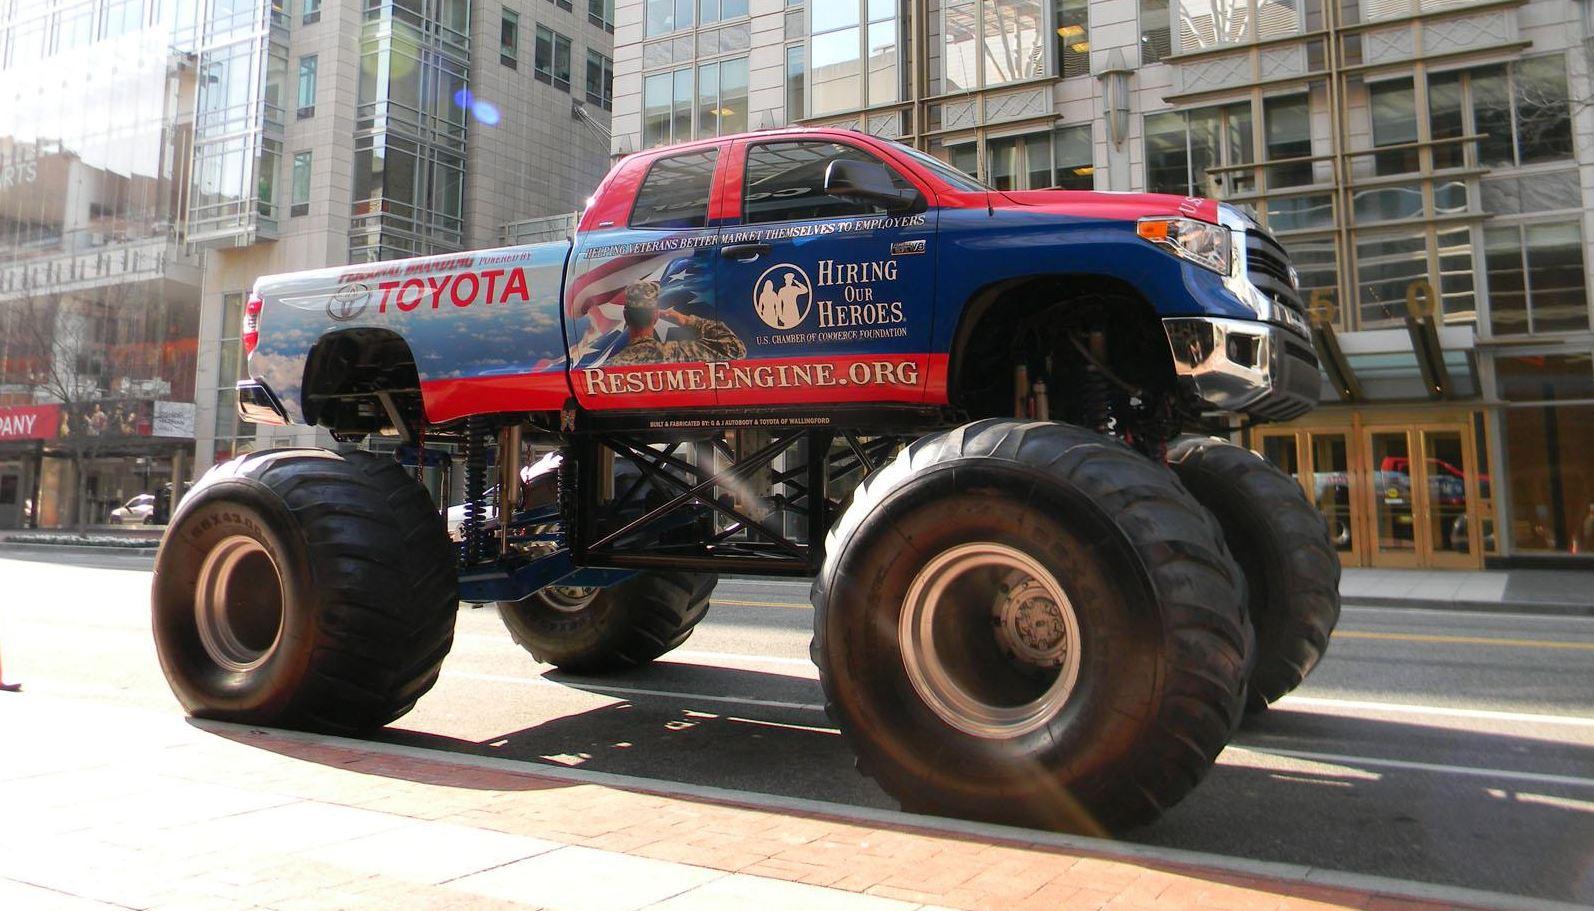 Toyota Tundra Monster Trucks